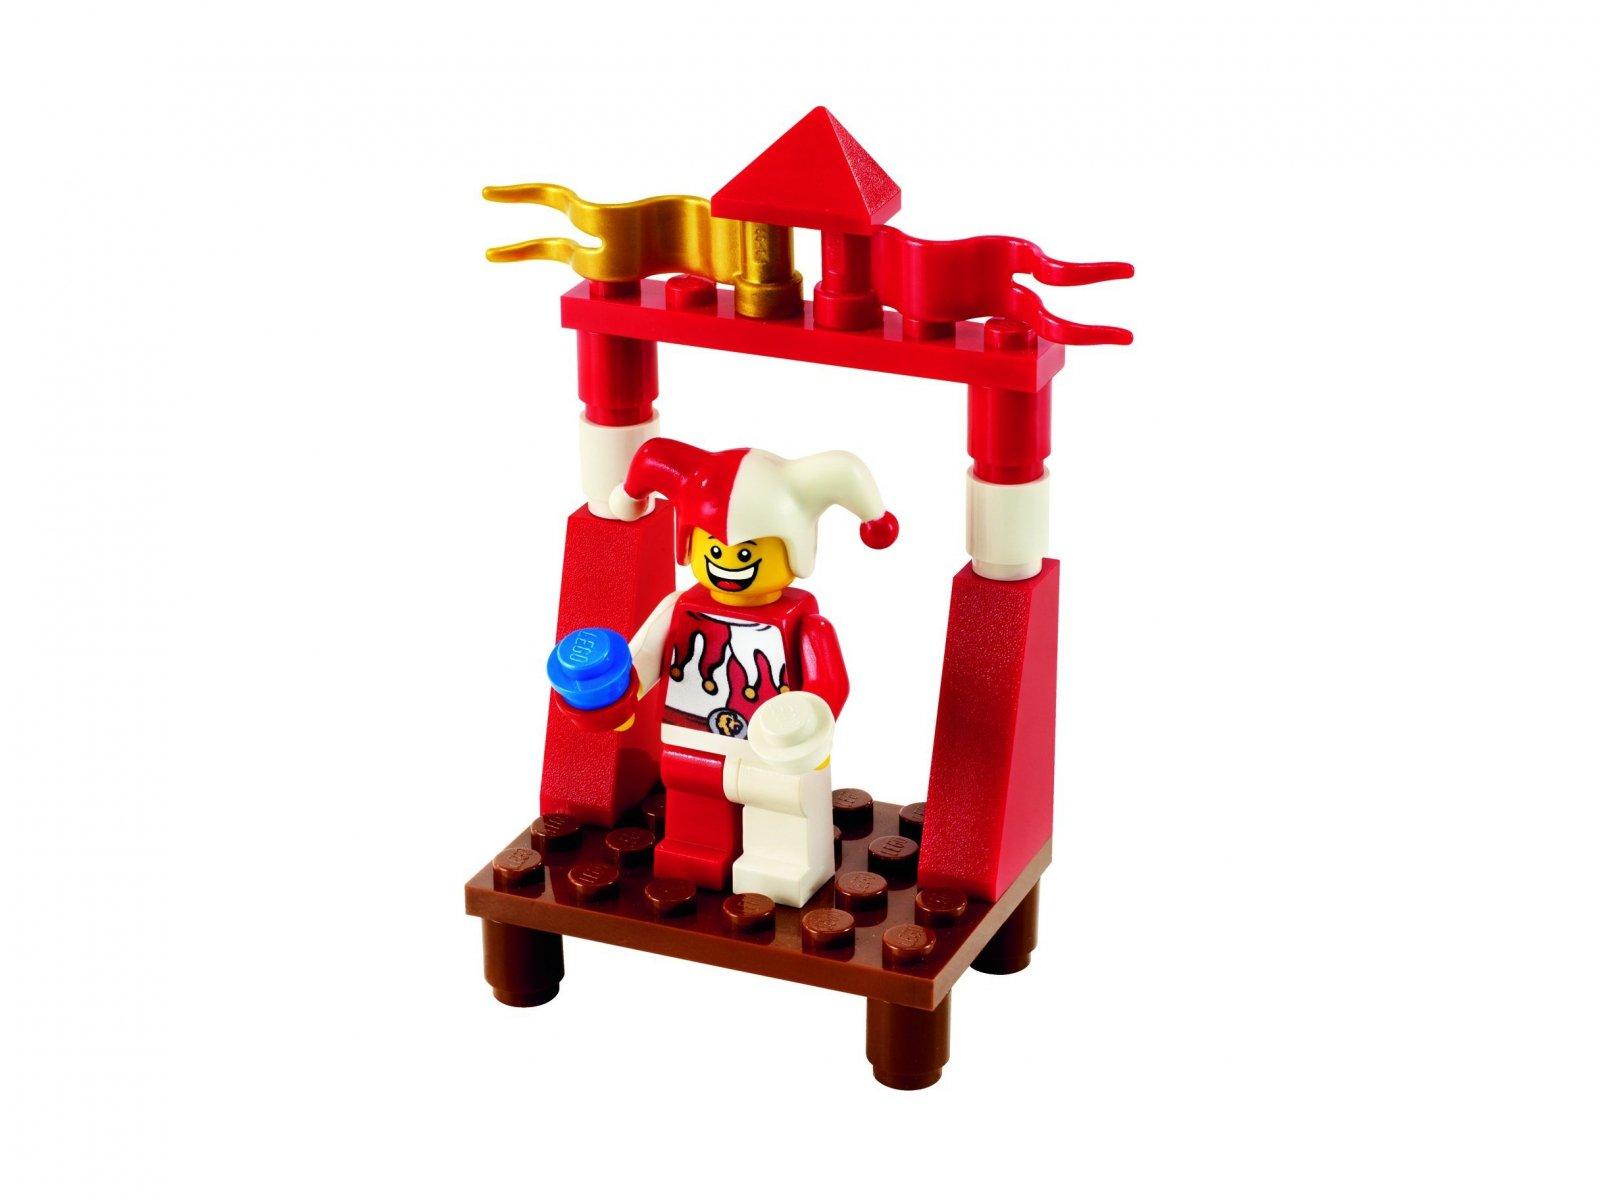 LEGO 7953 Błazen